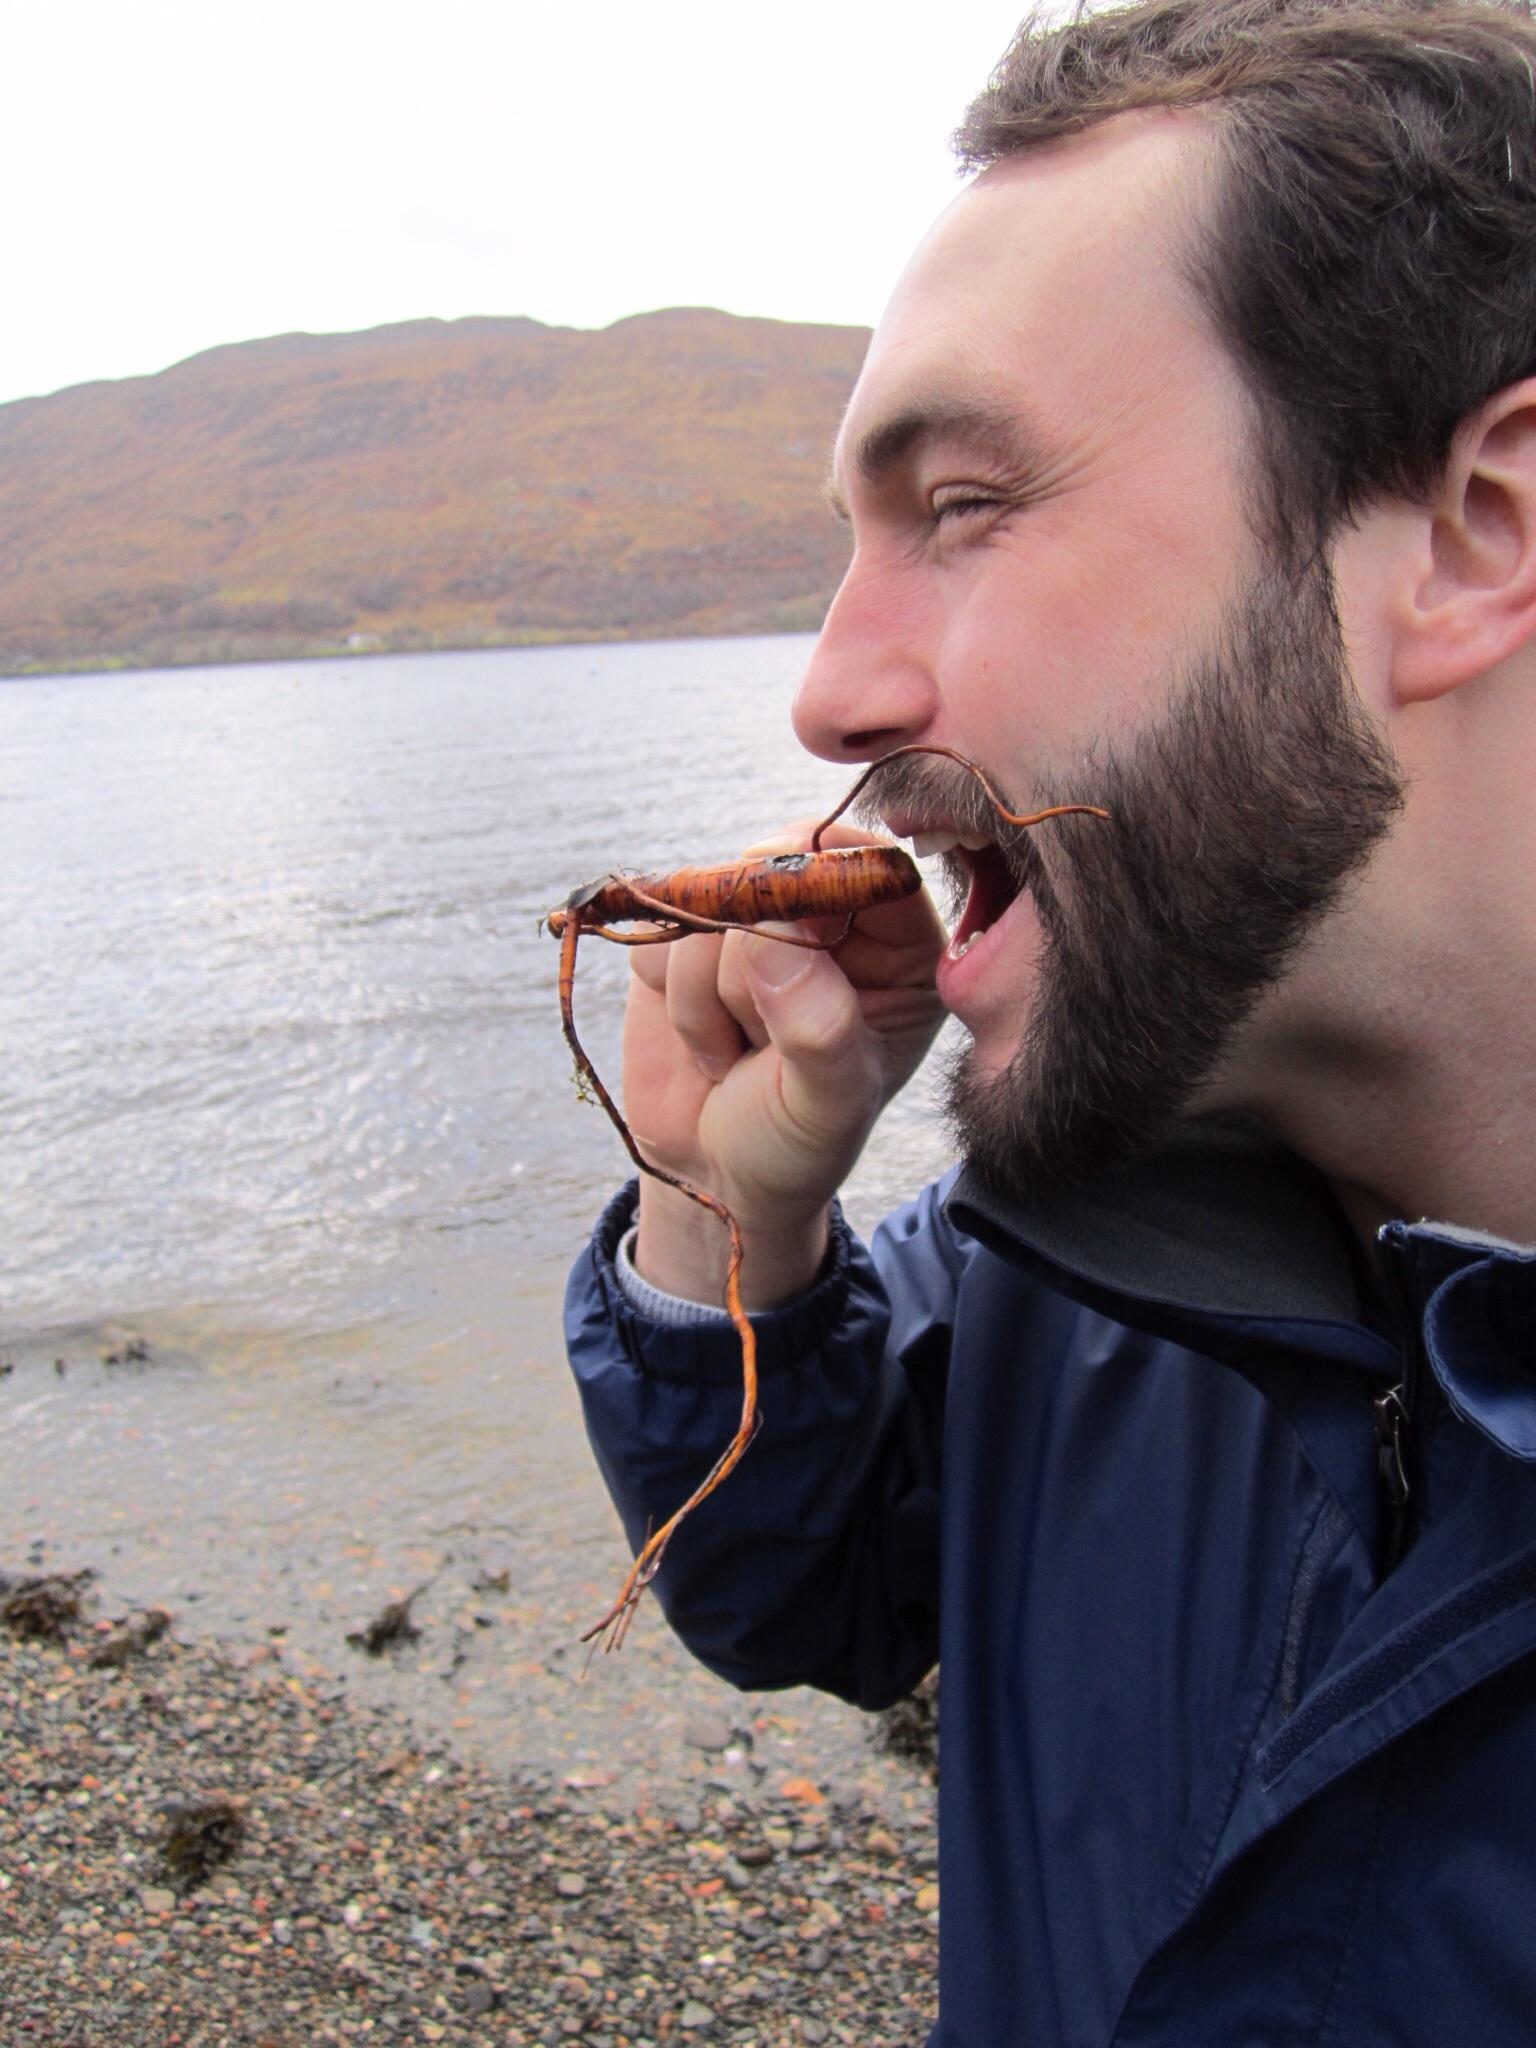 Sea carrot!